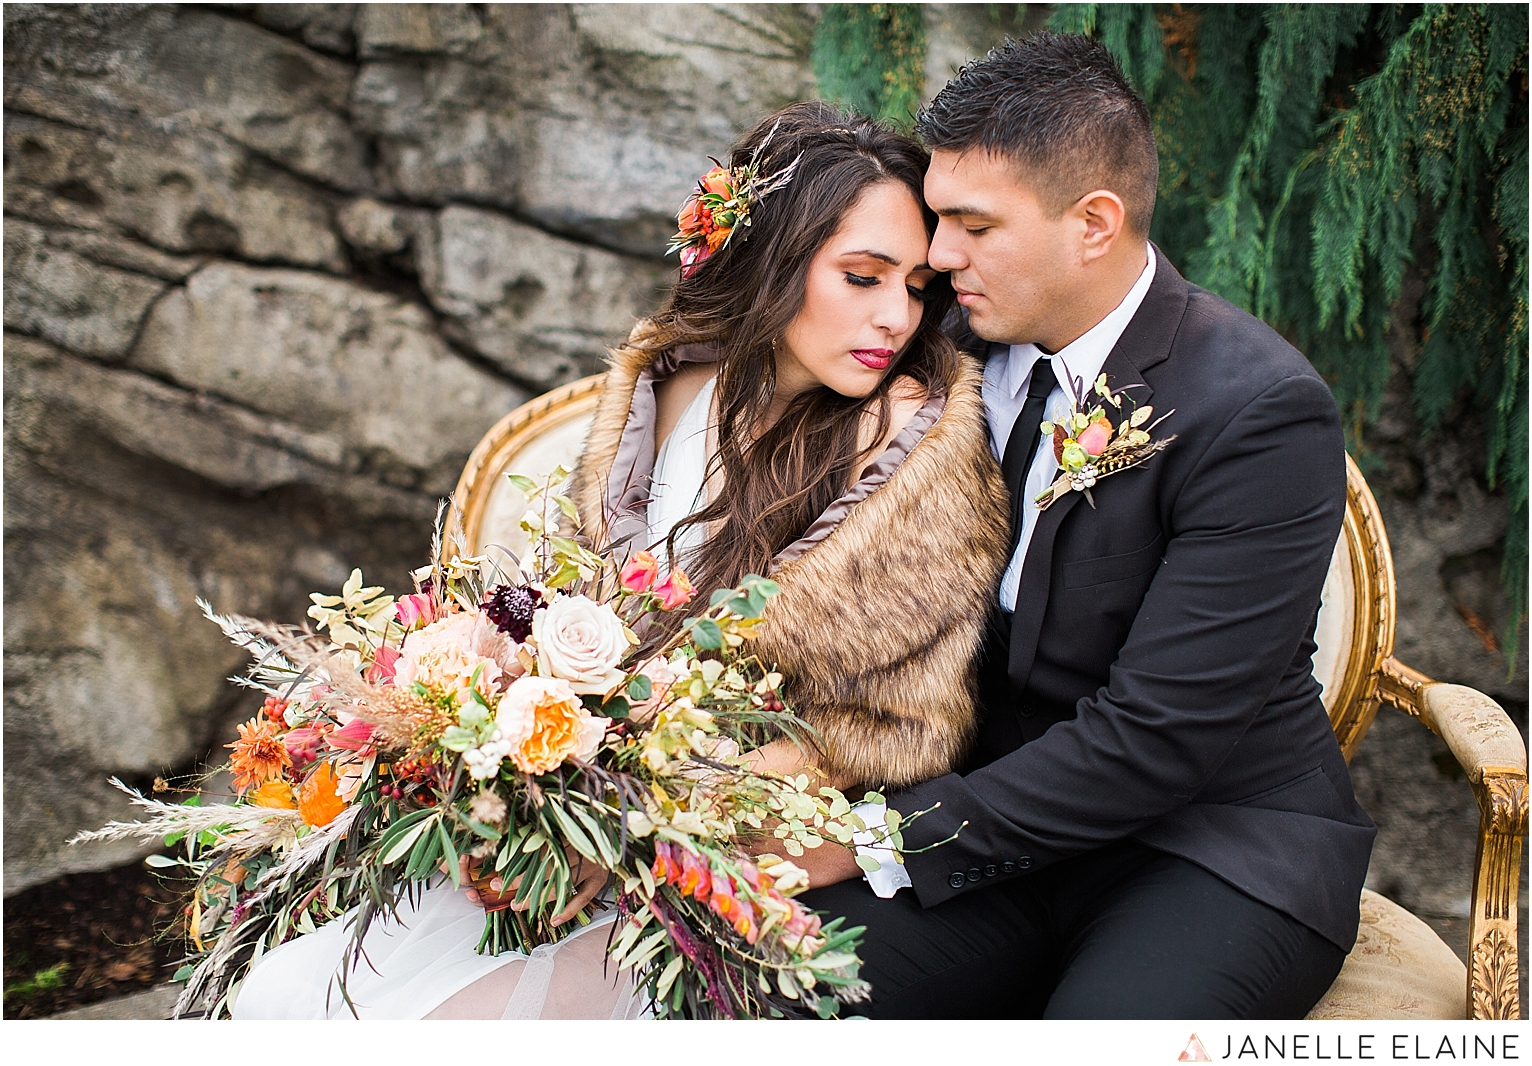 elopement-wedding-photographer-seattle washington-photographers-59.jpg